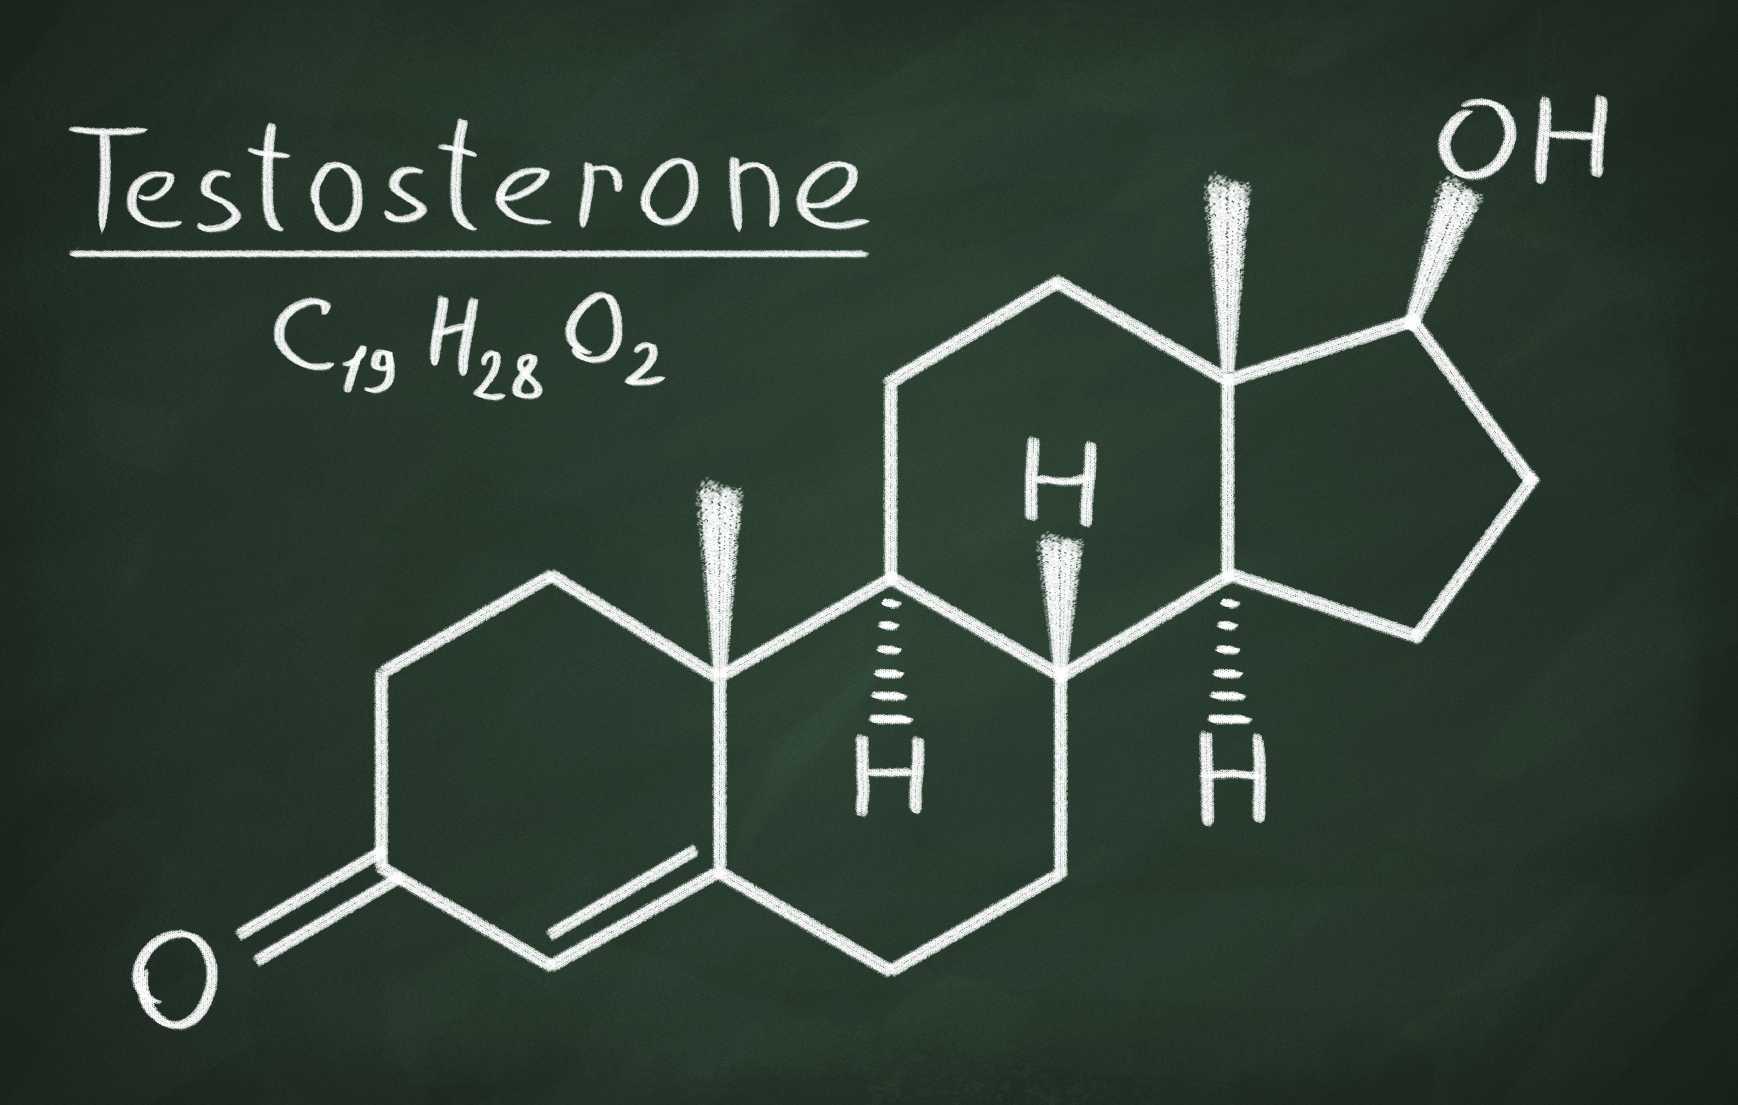 Testosterone and Diabetes